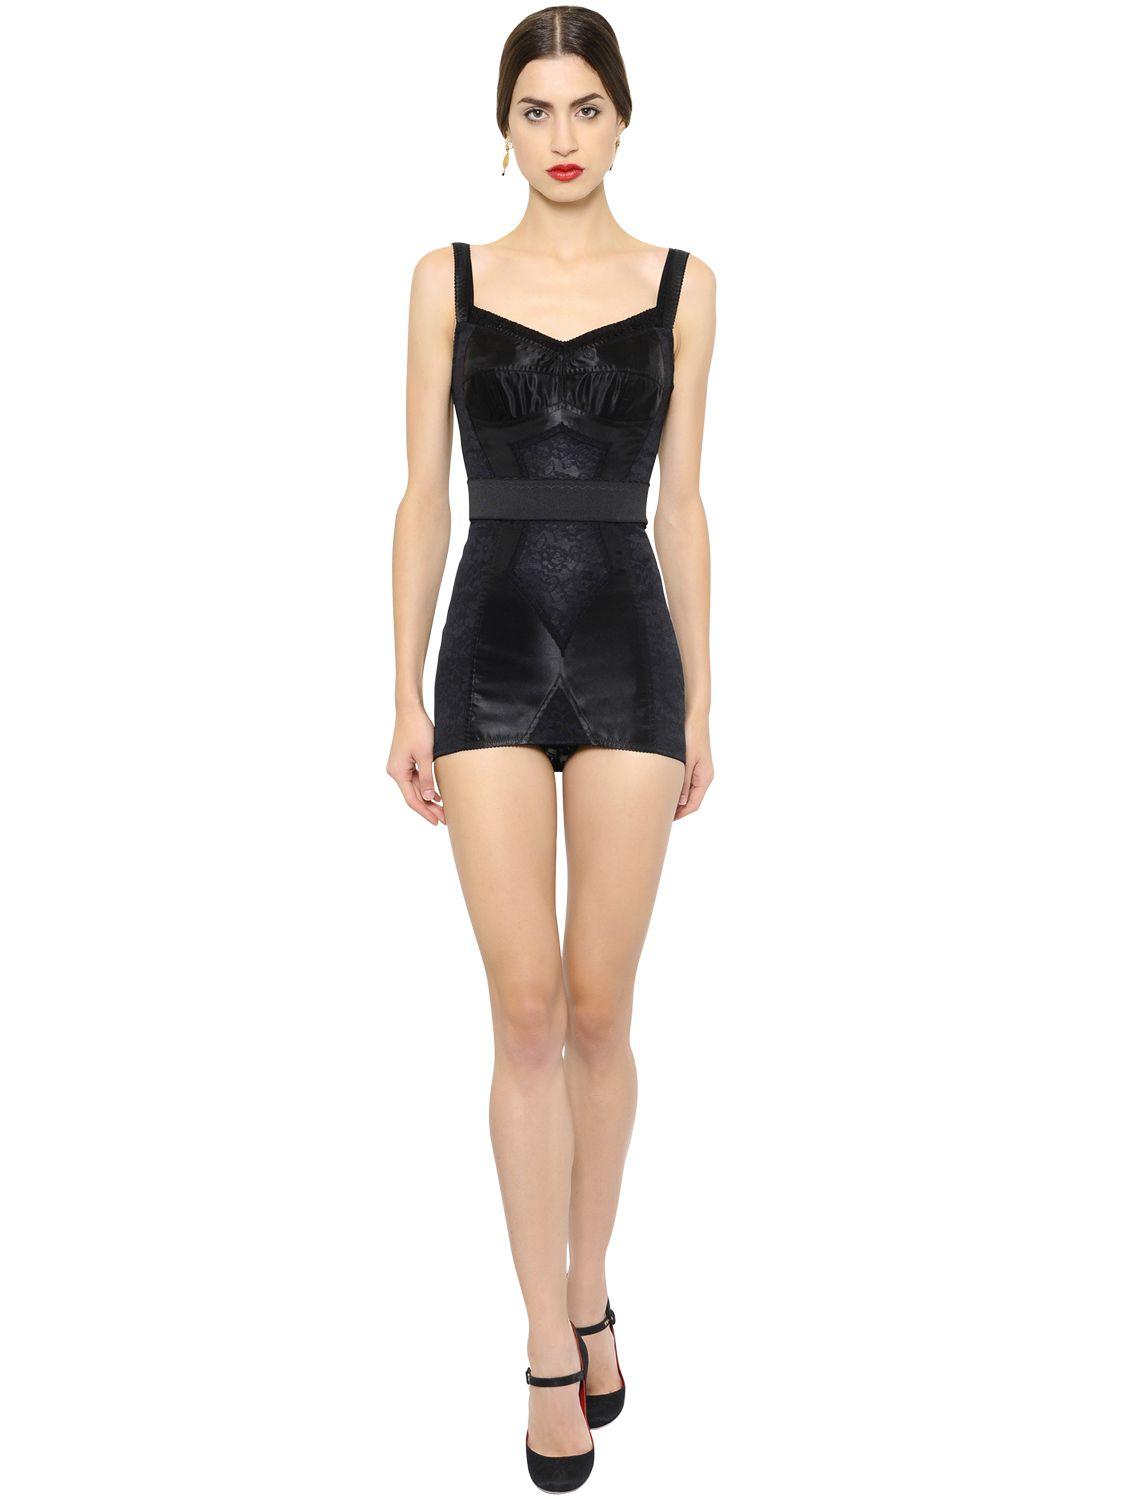 Dolce & gabbana Stretch Satin & Lace Corset Dress in Black | Lyst